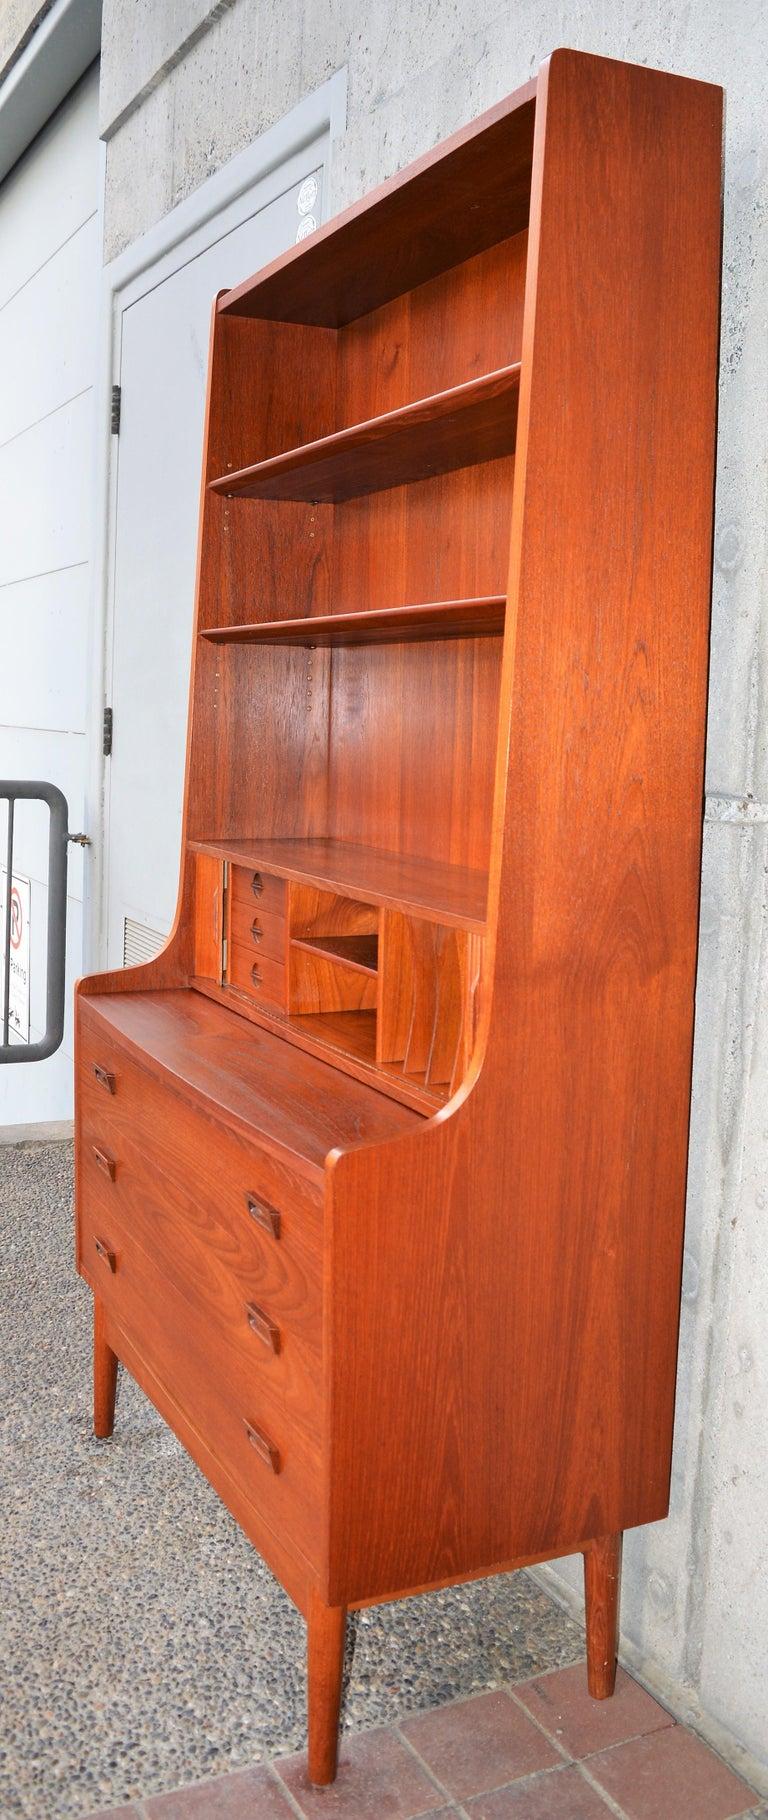 Danish Modern Teak Secretary/Dresser by Johannes Sorth for Bornholm Mobelfabrik For Sale 6